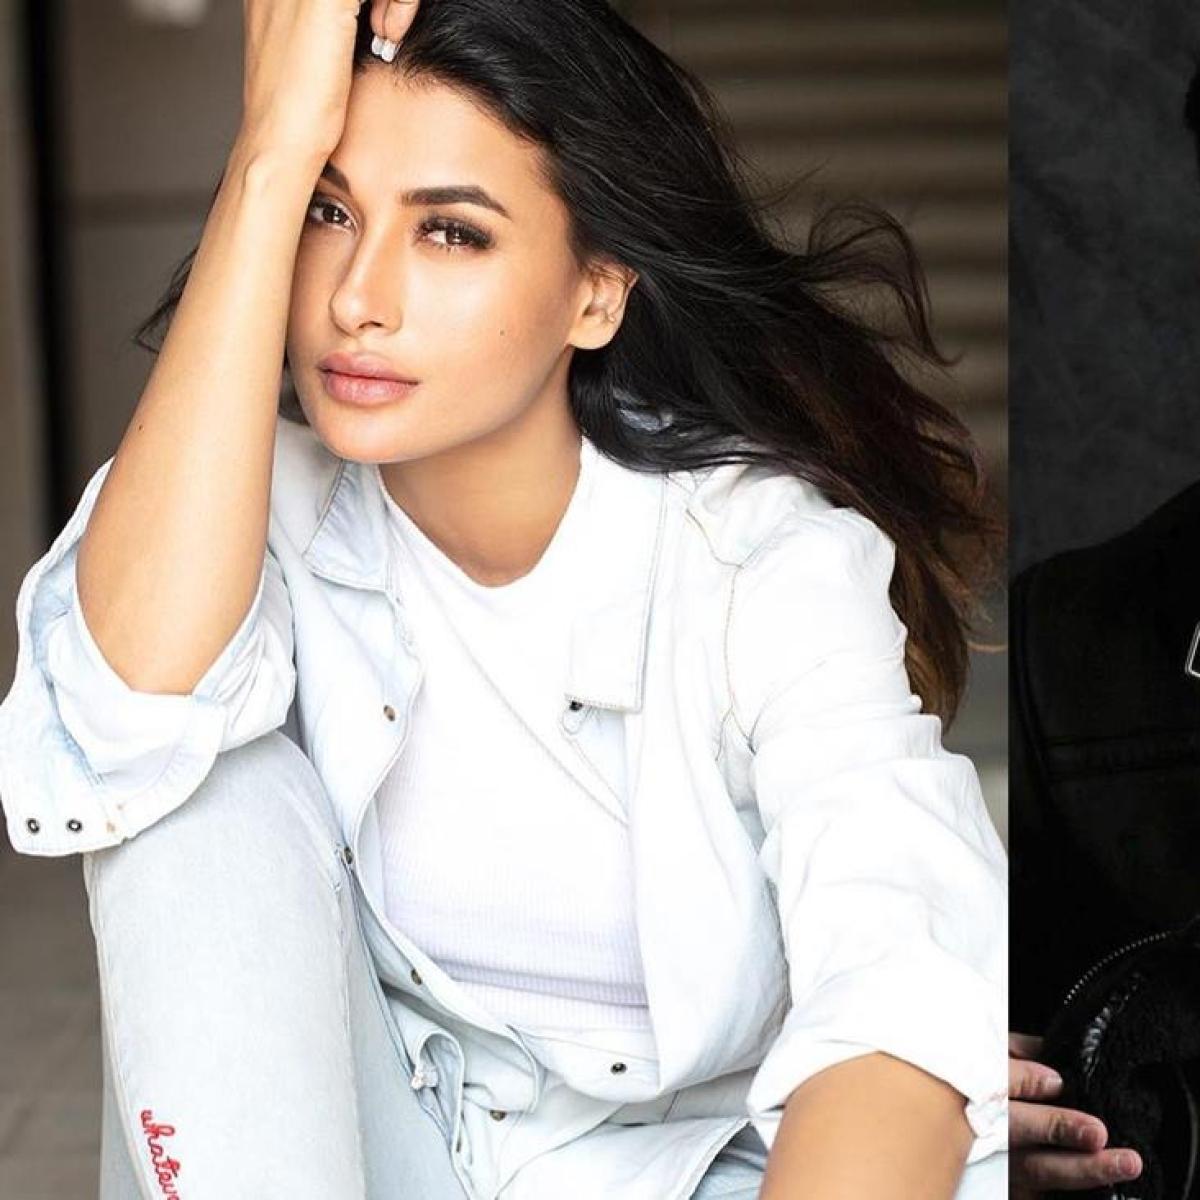 Bigg Boss 14: Pavitra Punia's ex-boyfriend Pratik Sehajpal to enter the show as a 'confirmed contestant'